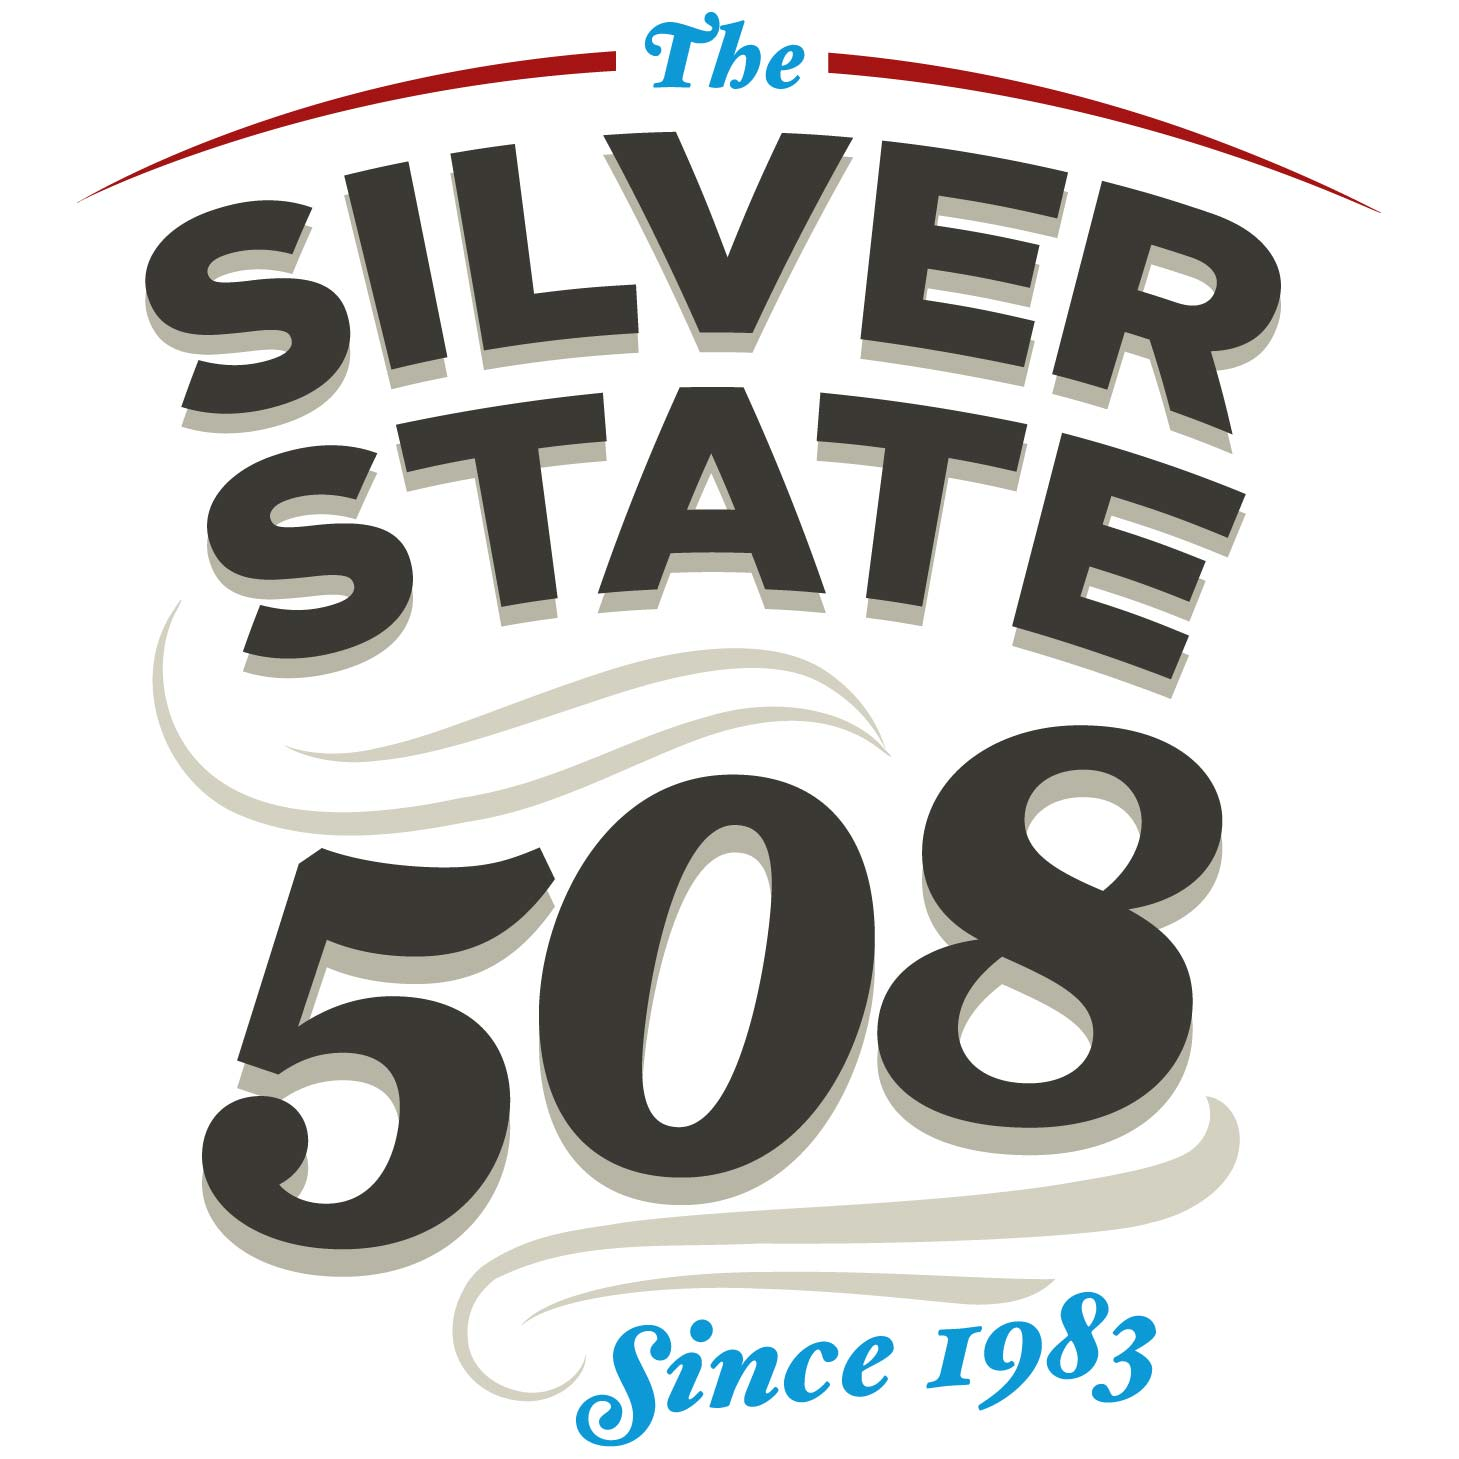 silverstate508logo square 700x700.jpg